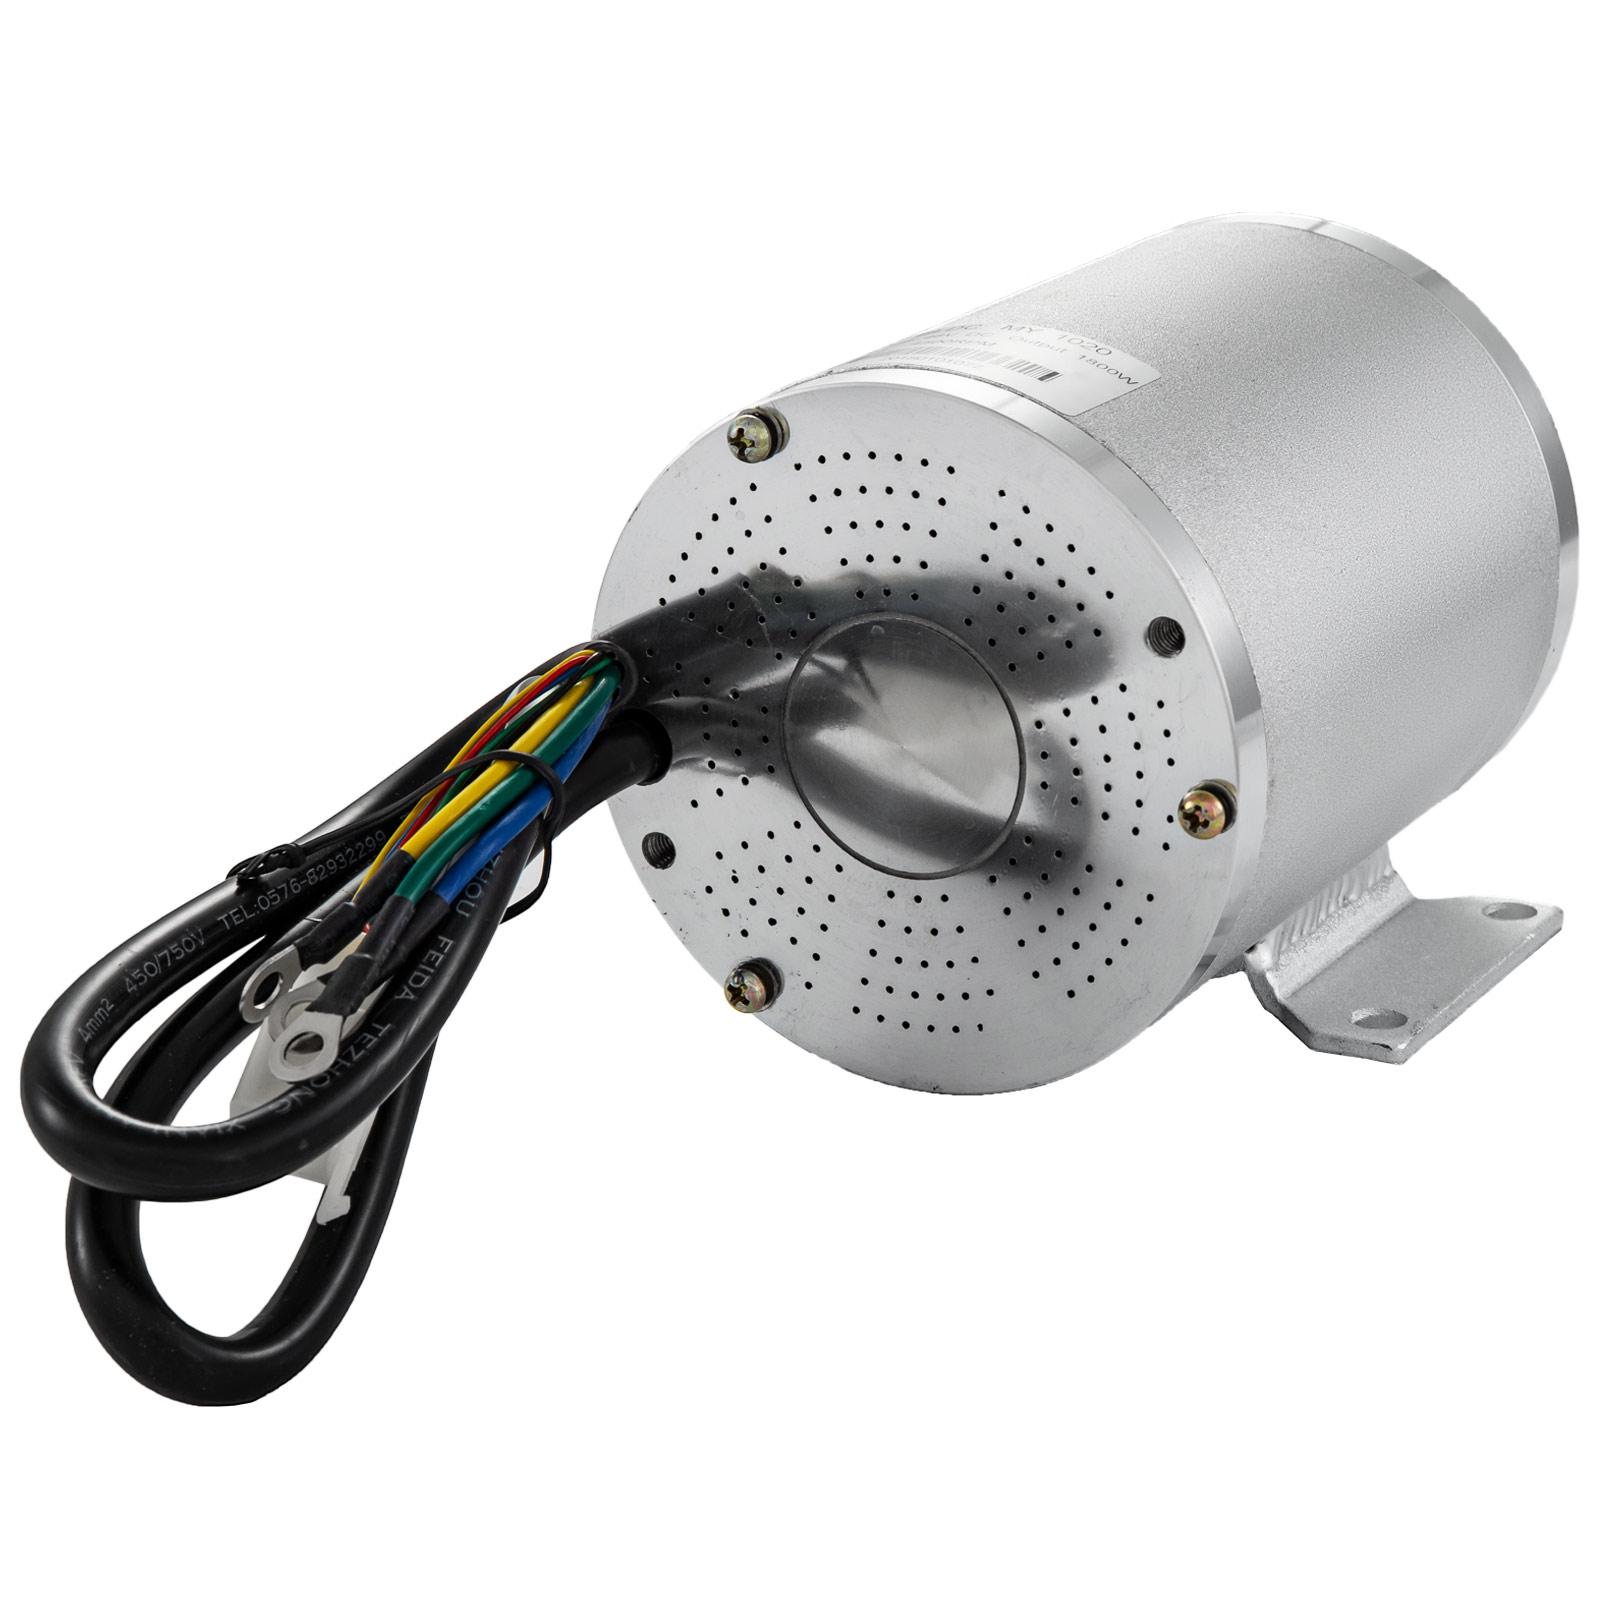 1800W-48V-DC-Brushless-Electric-Motor-Kit-f-Scooter-500-1800W-E-Bike-Go-Kart thumbnail 238